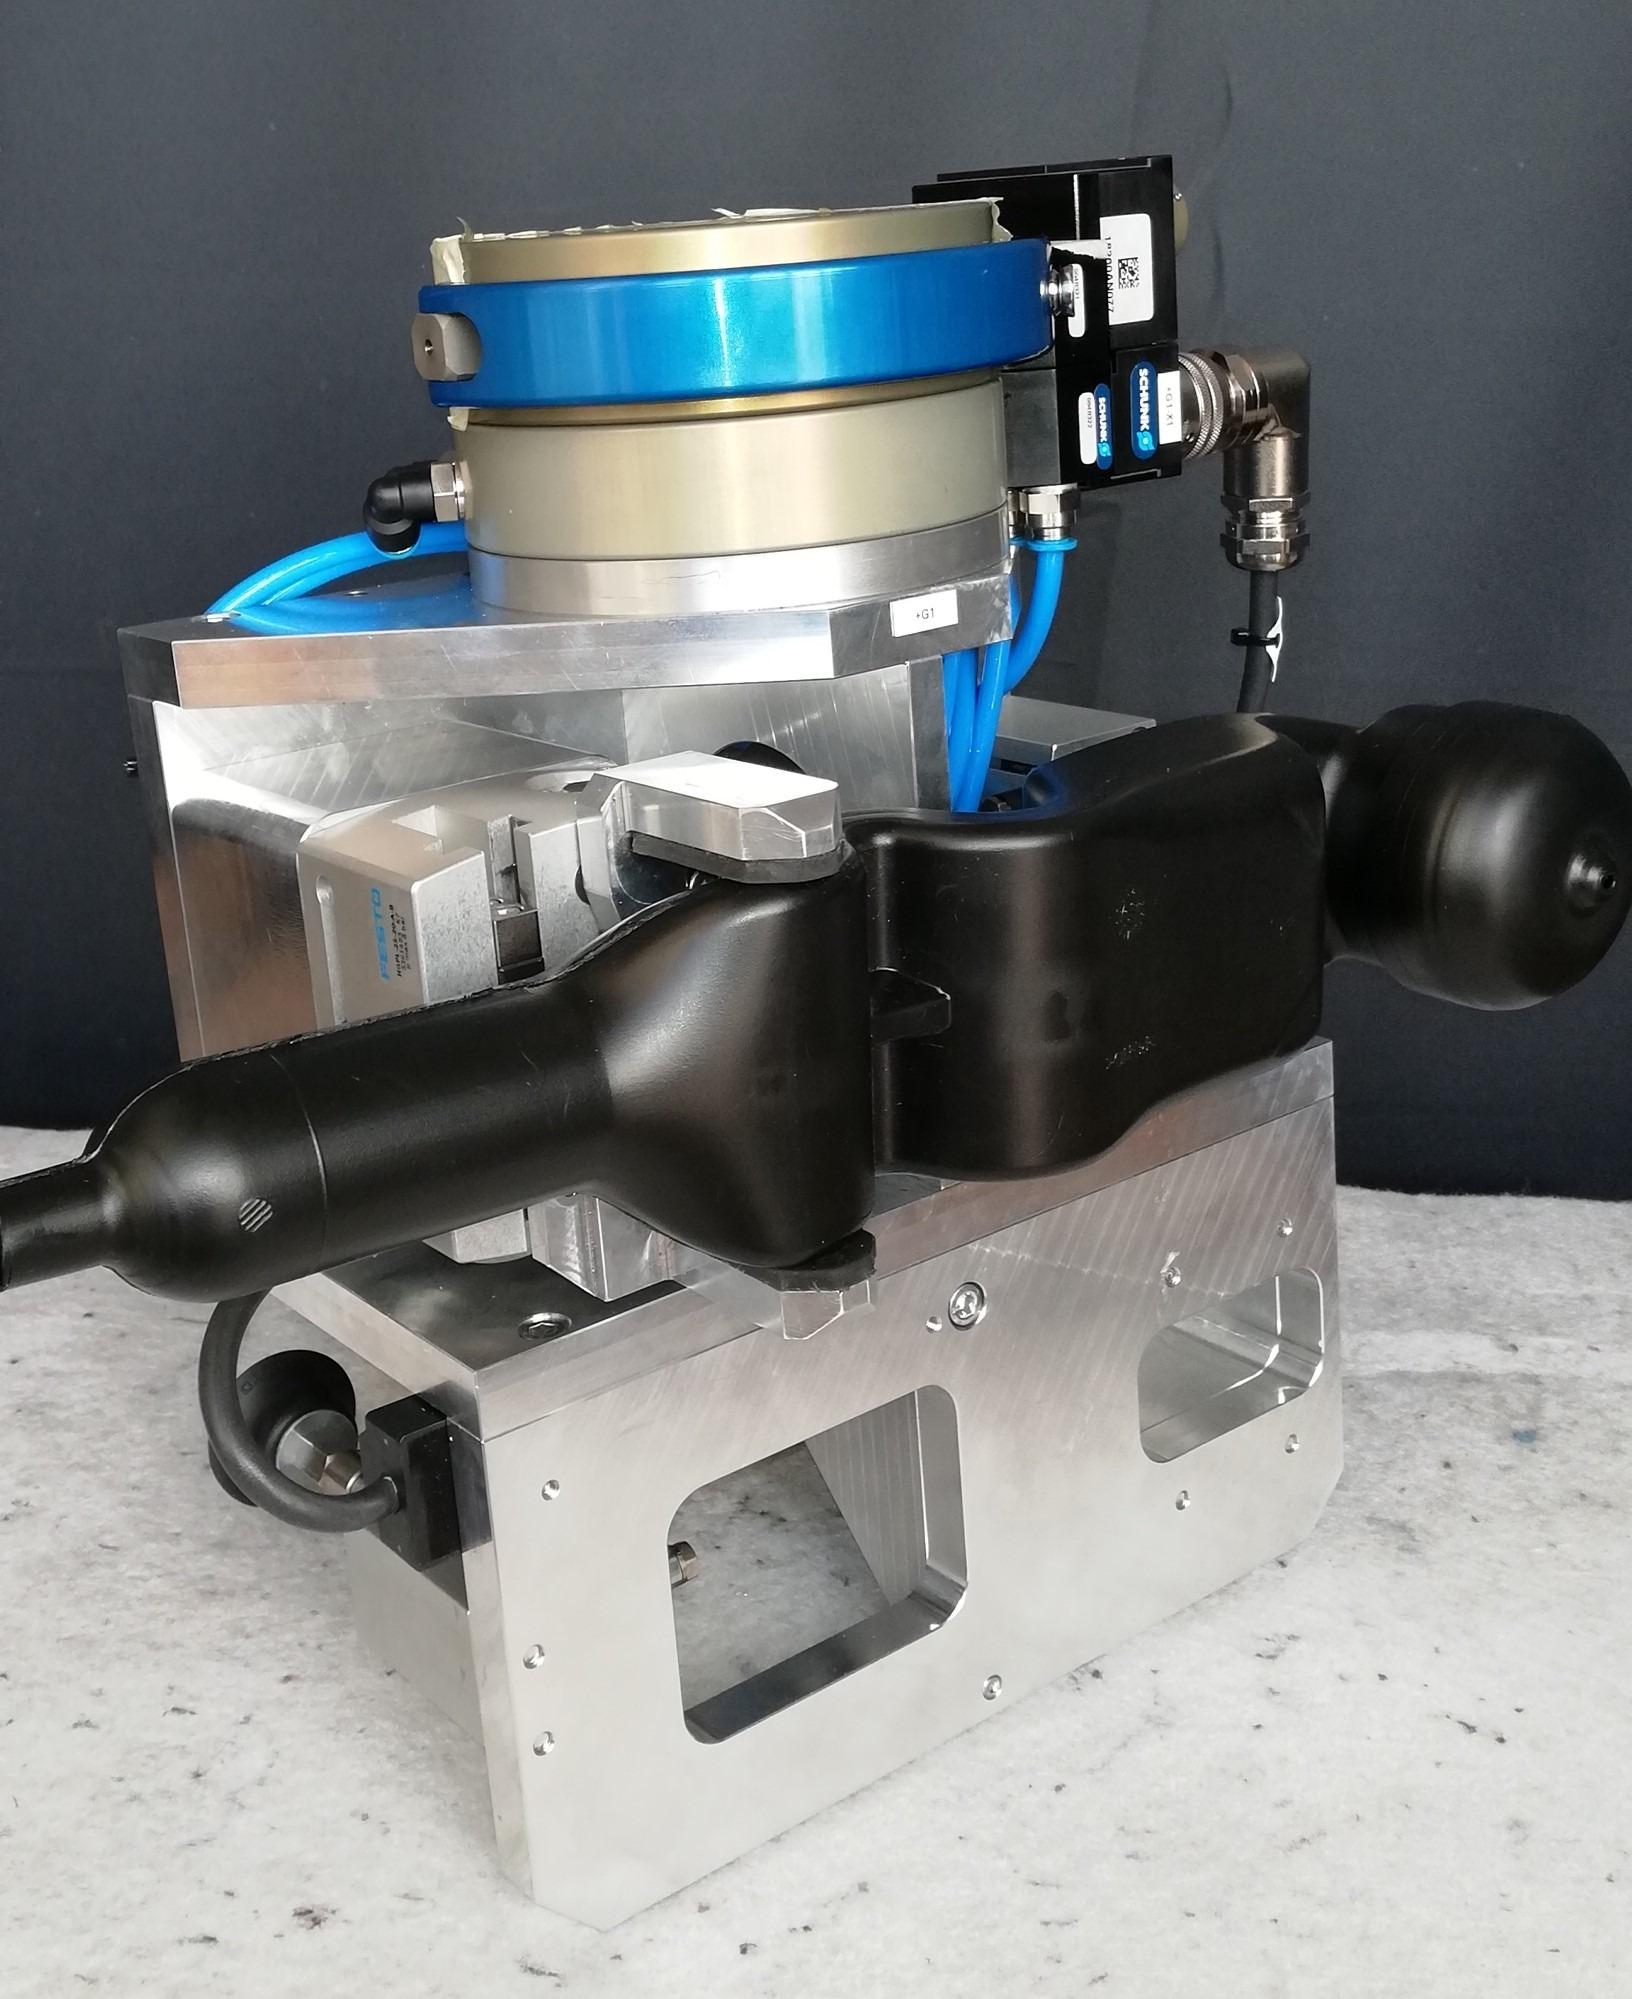 Robotik: Doppel-Siphon-Greifer